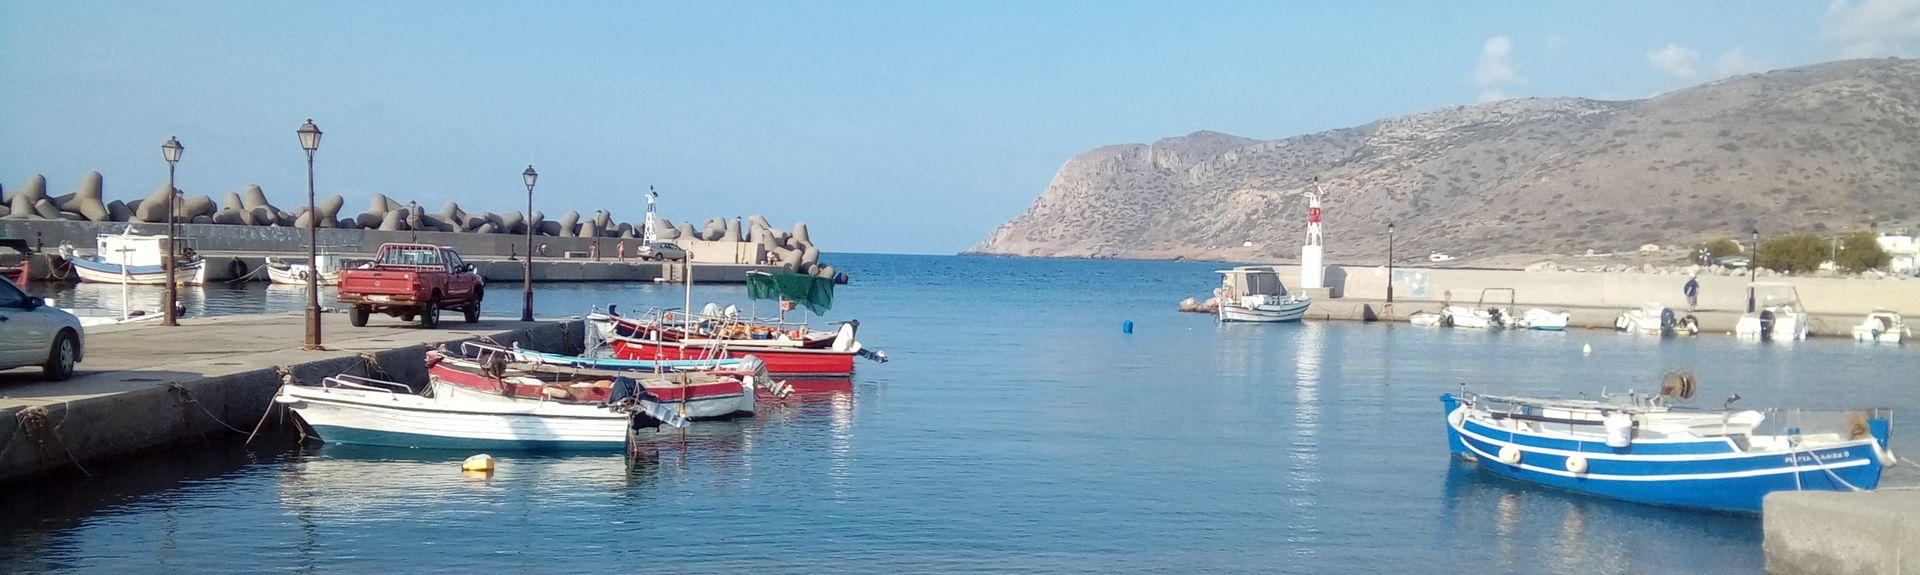 Chersonissos, Kreta, Griechenland